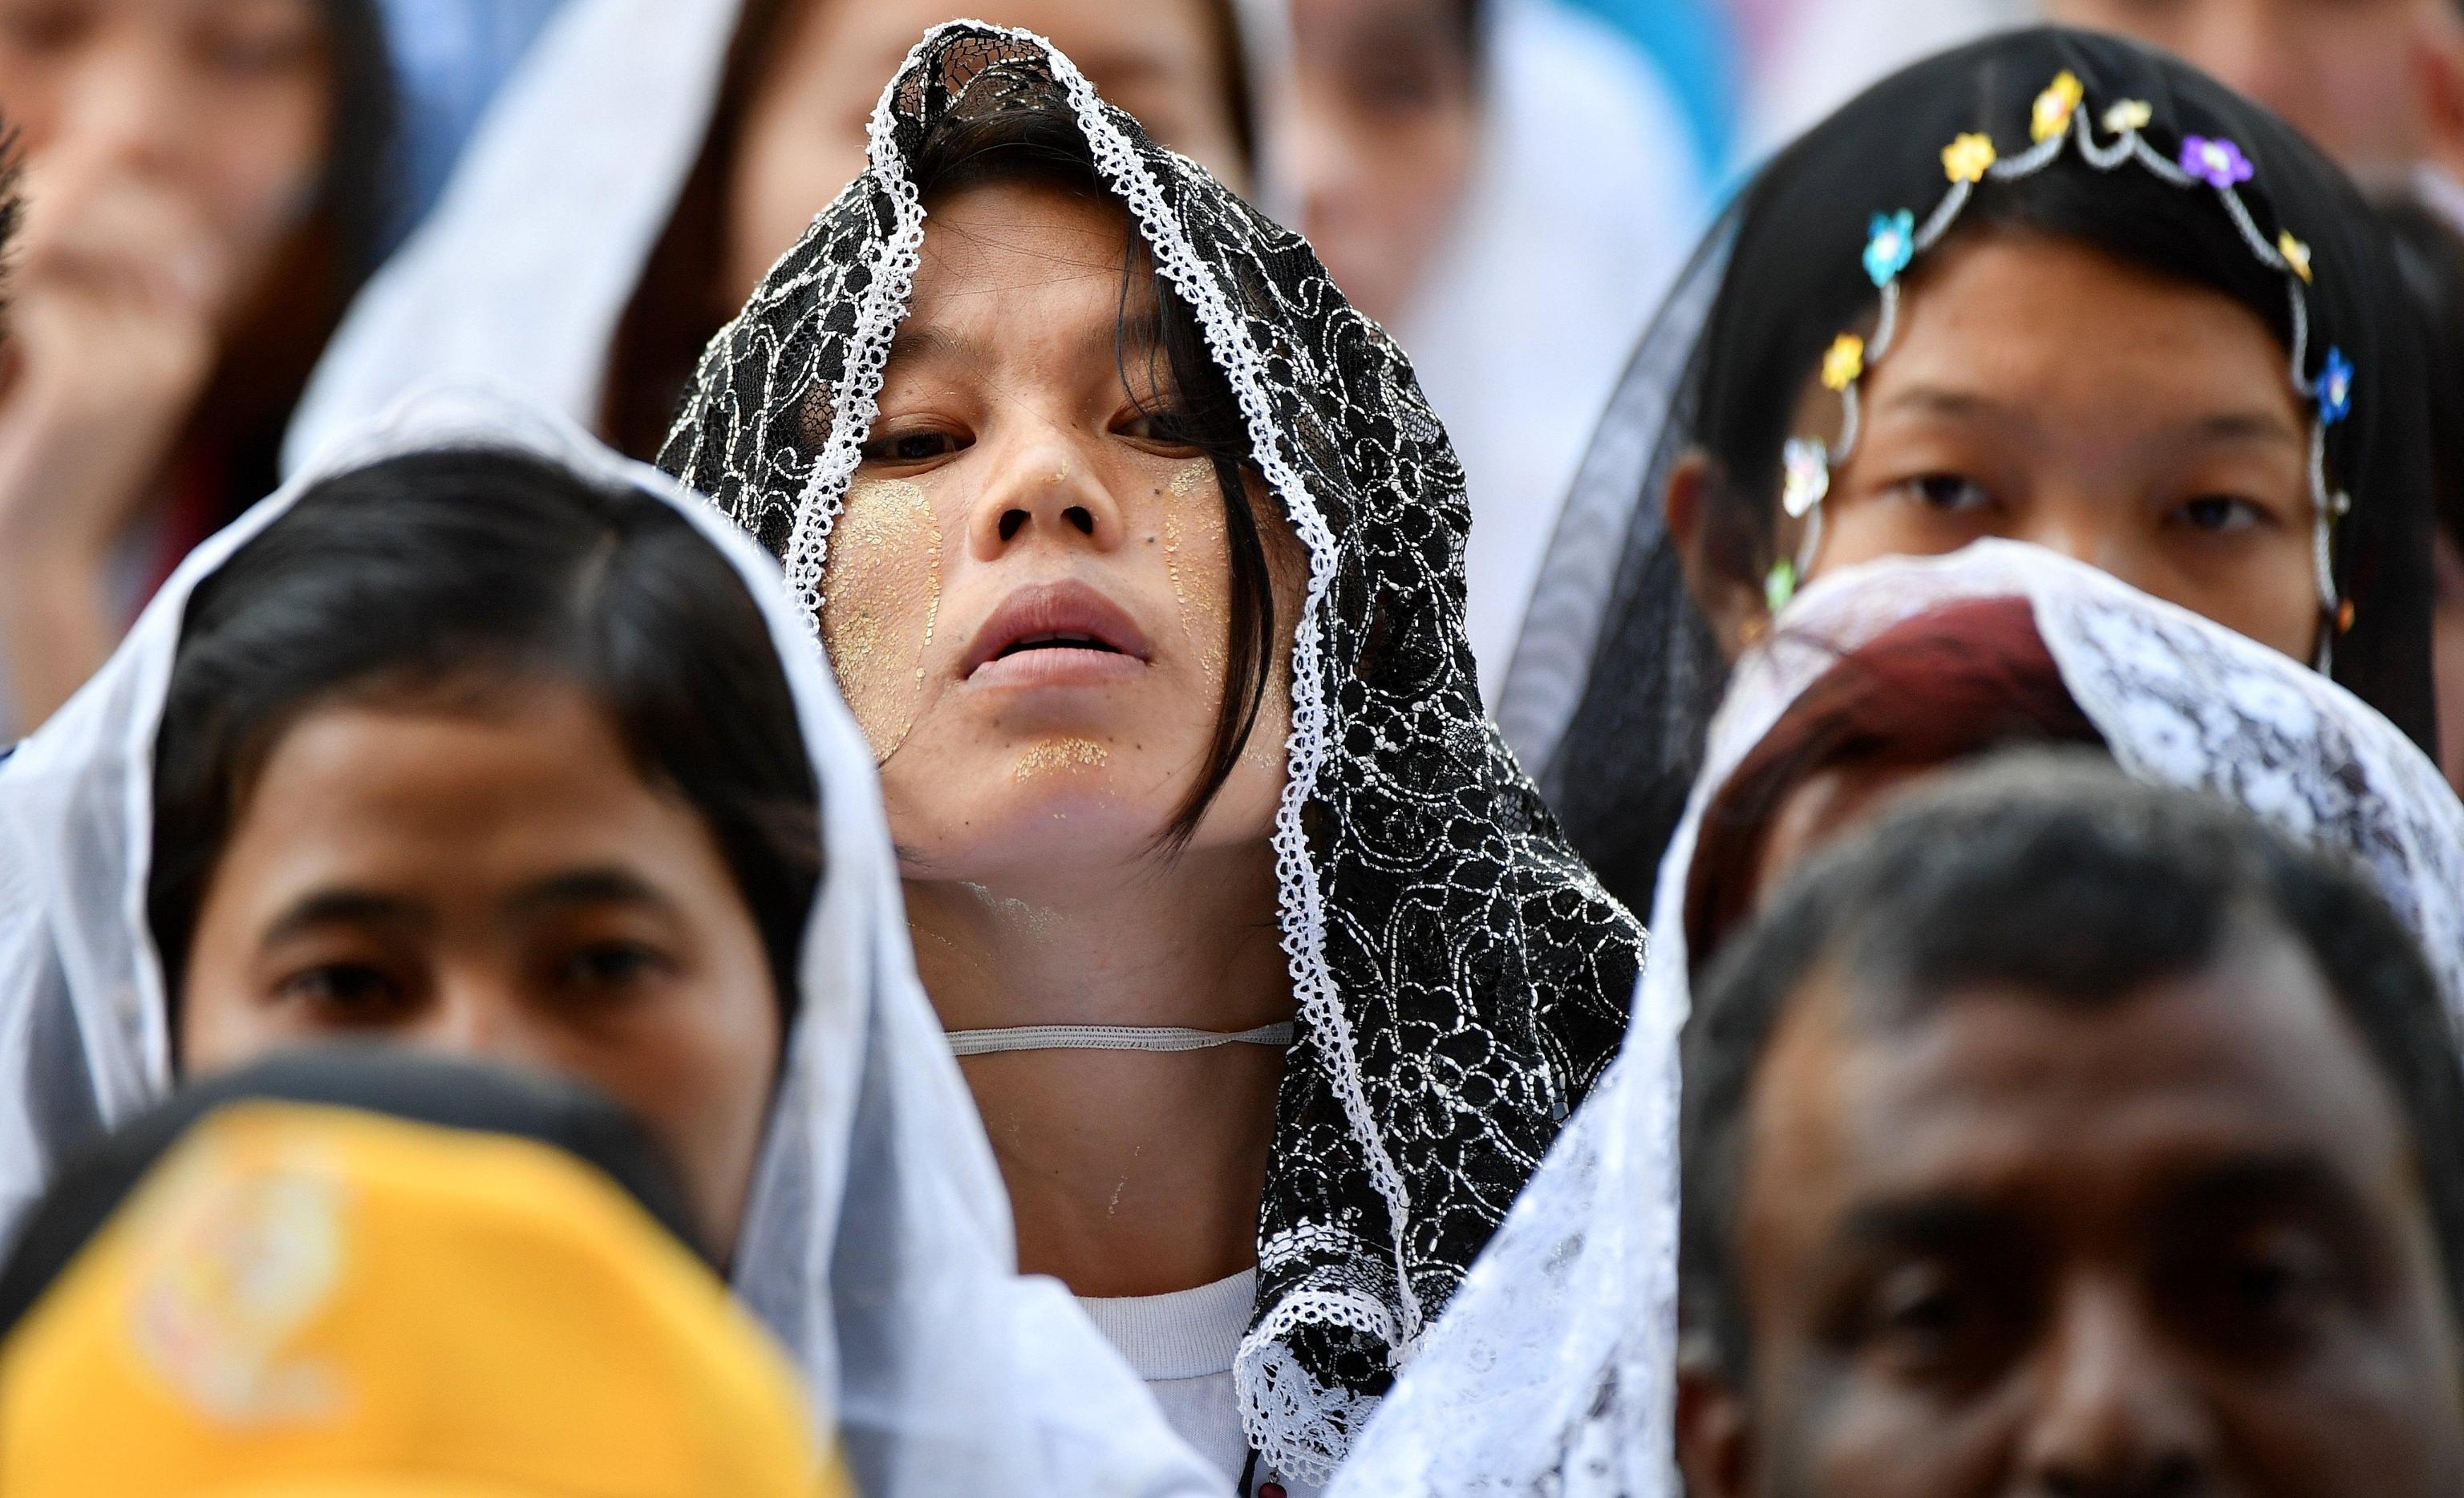 fedeli-alla-messa-con-papa-francesco-in-myanmar-foto-ansa